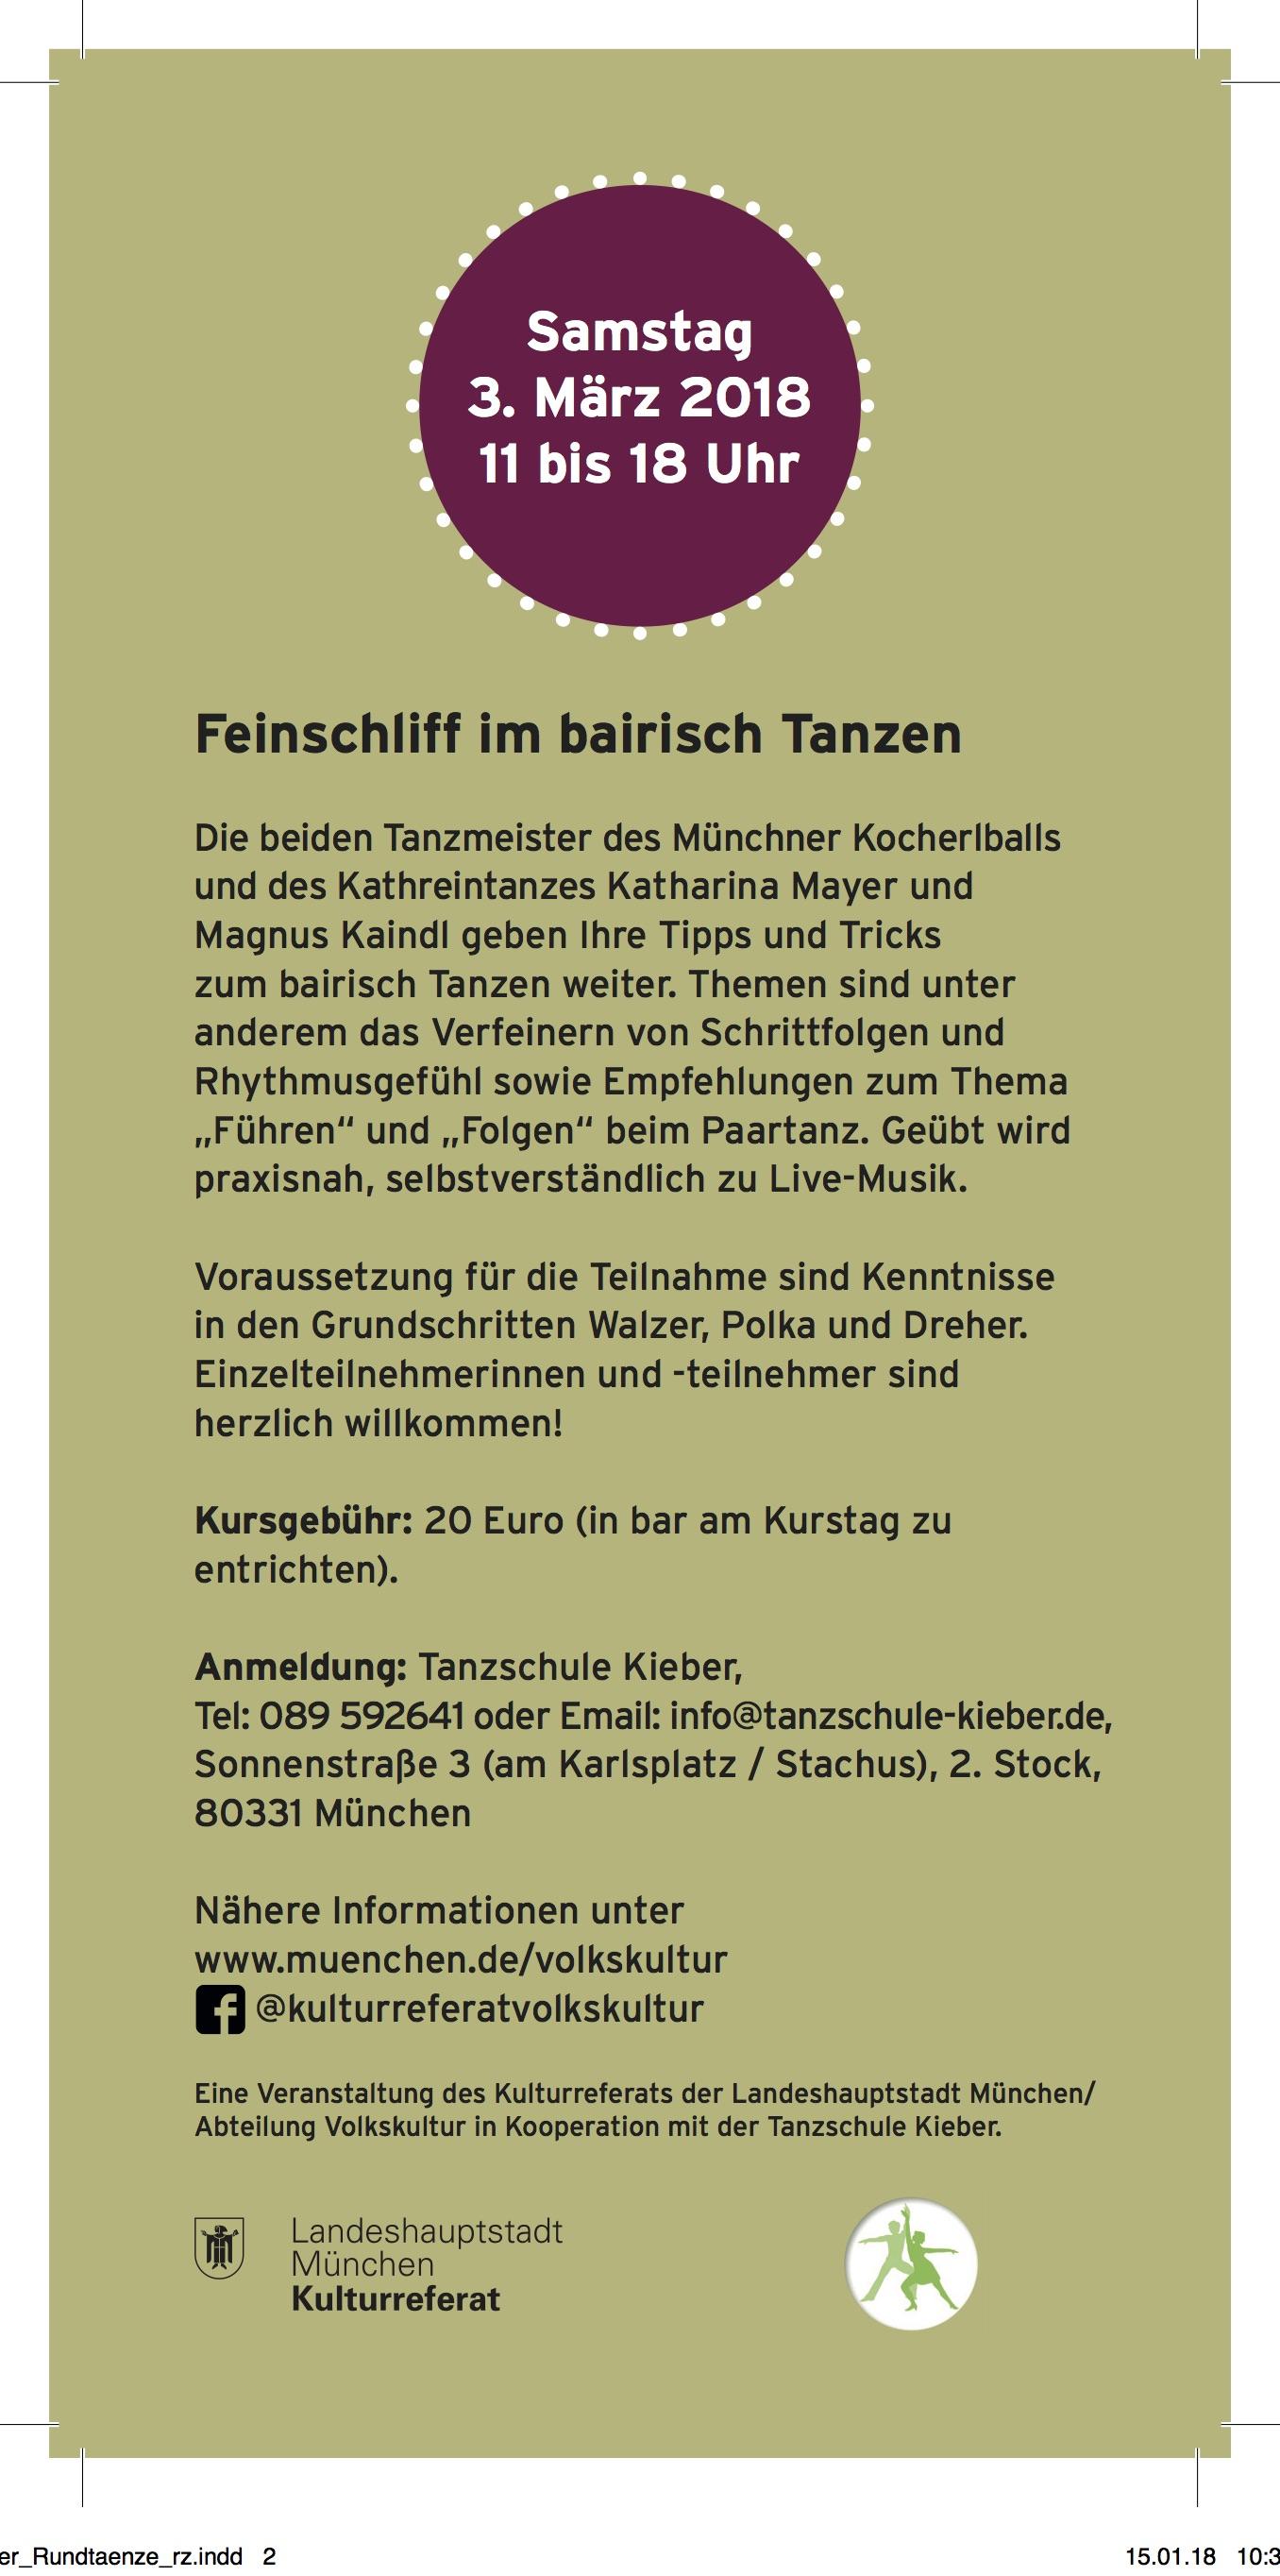 Flyer_Rundtaenze_rz_rs.jpg